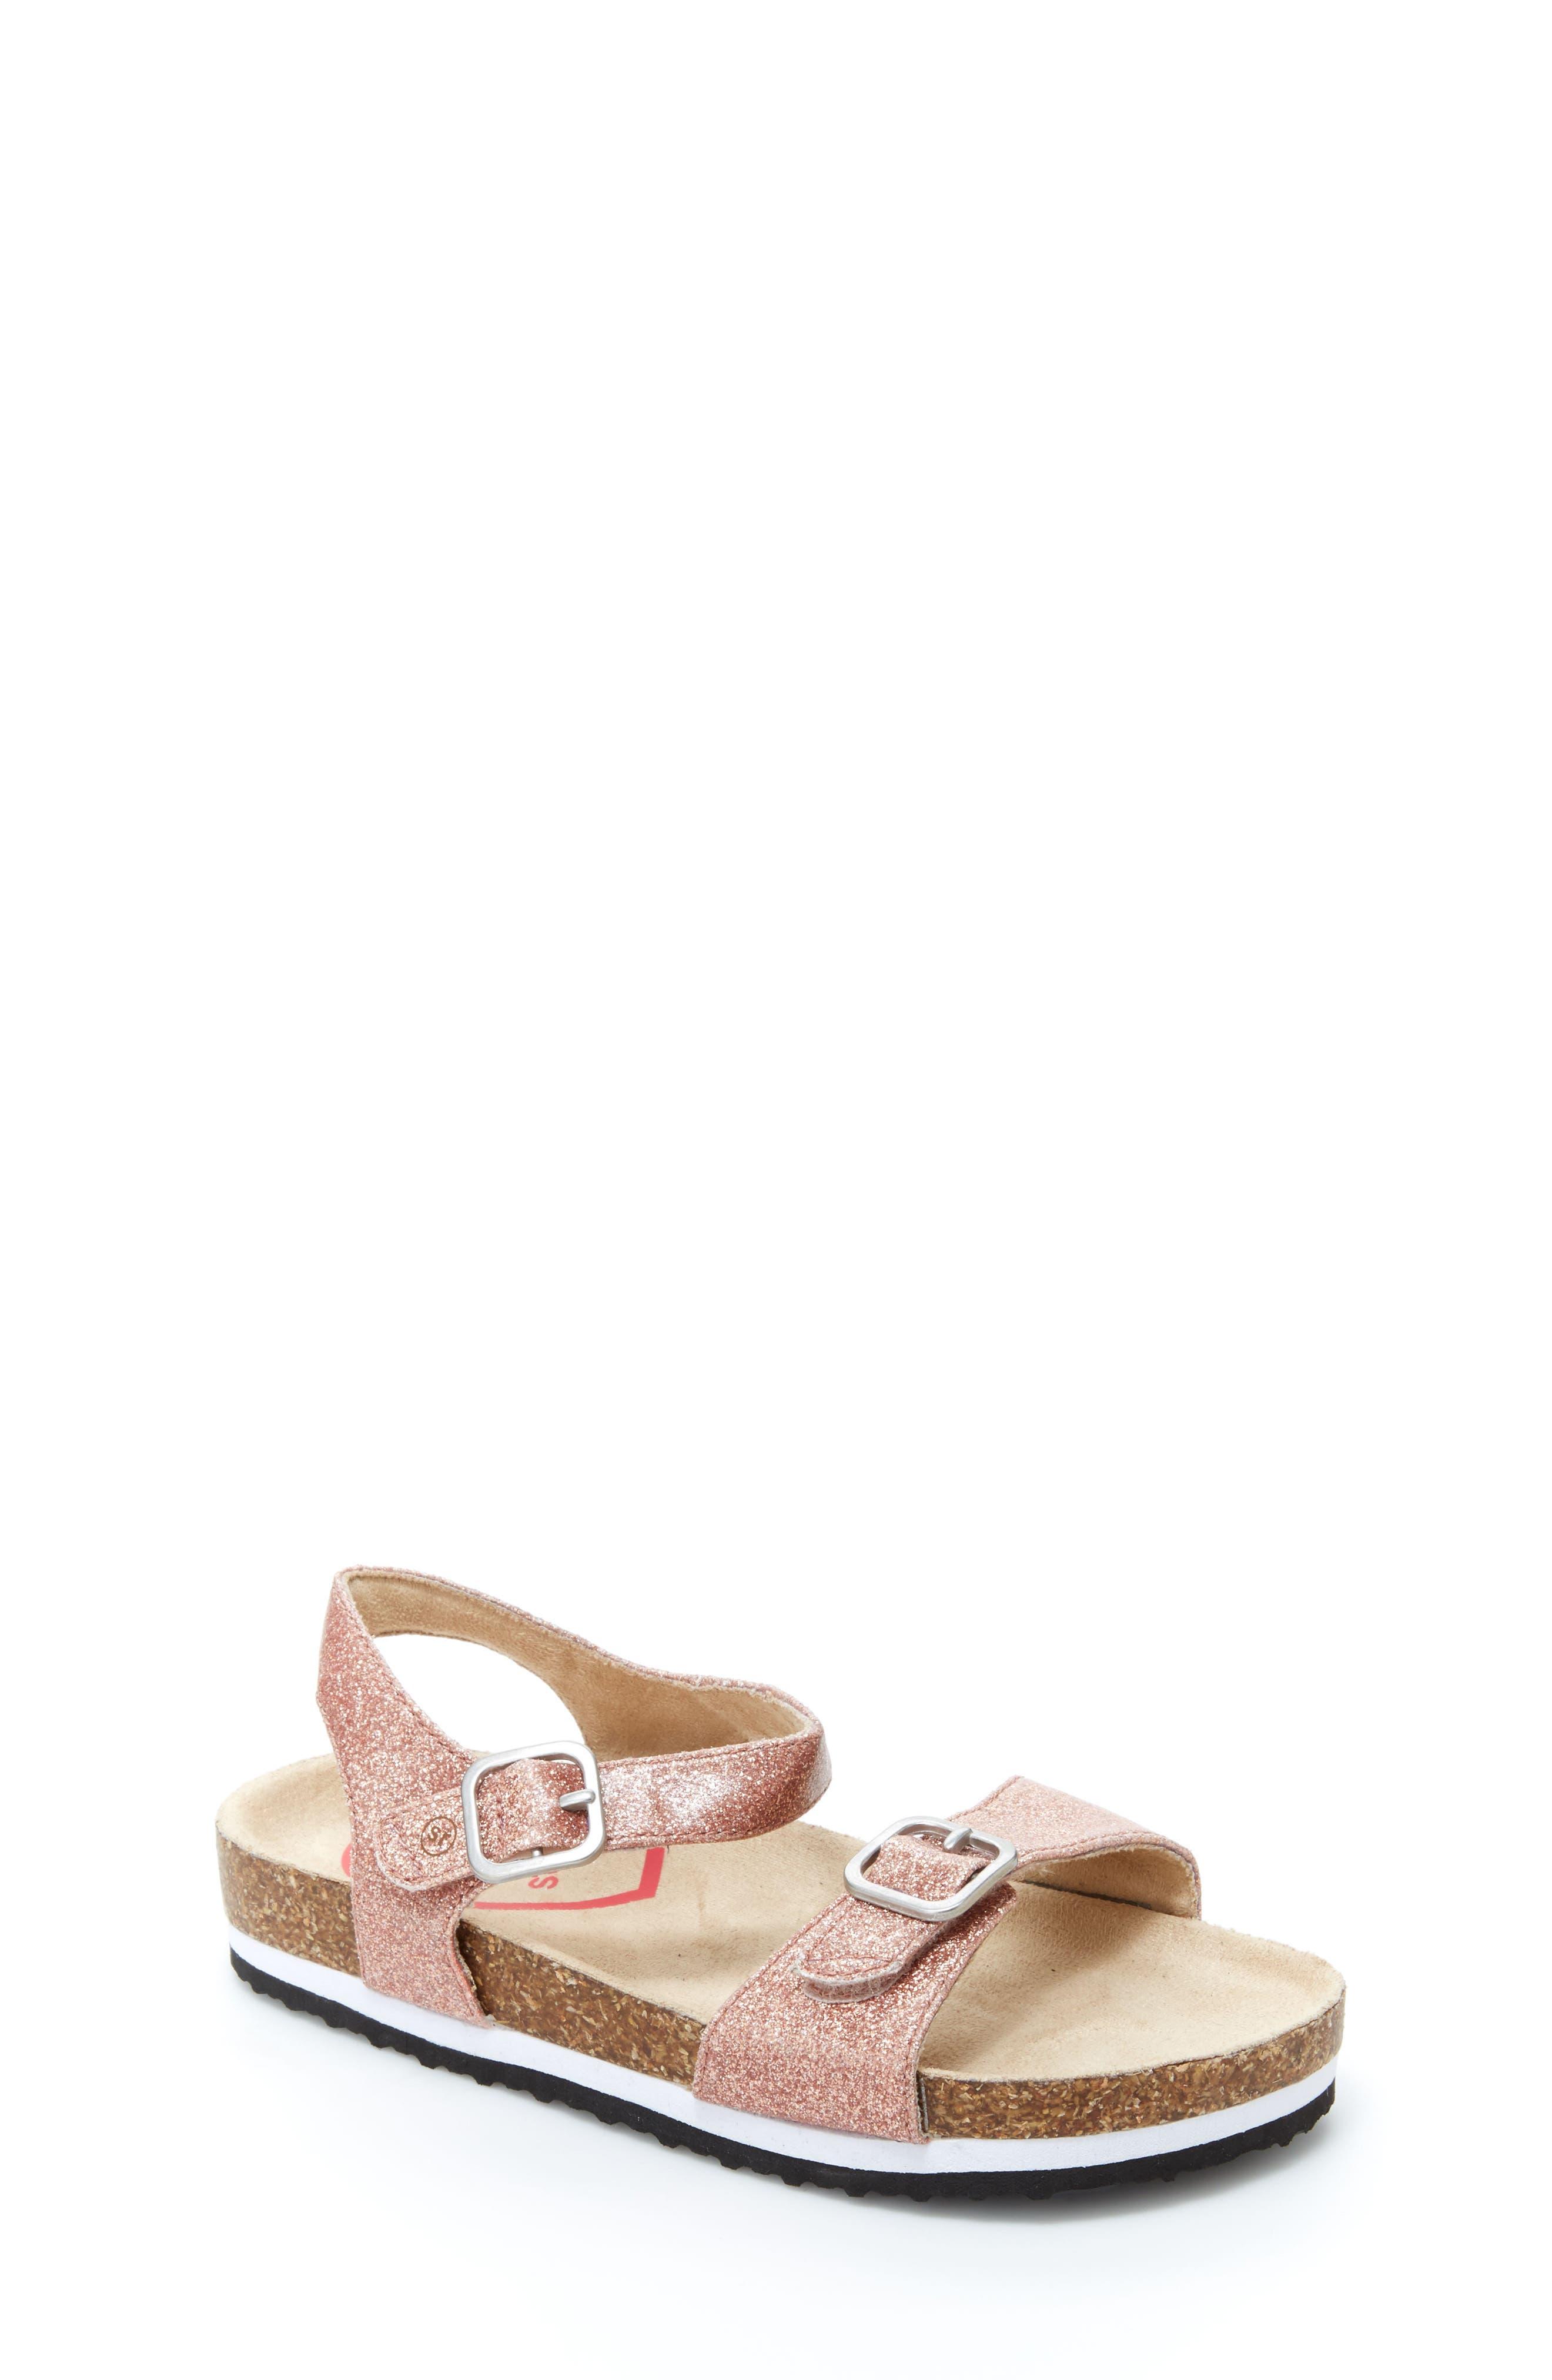 Zuly Glitter Sandal,                         Main,                         color, ROSE GOLD